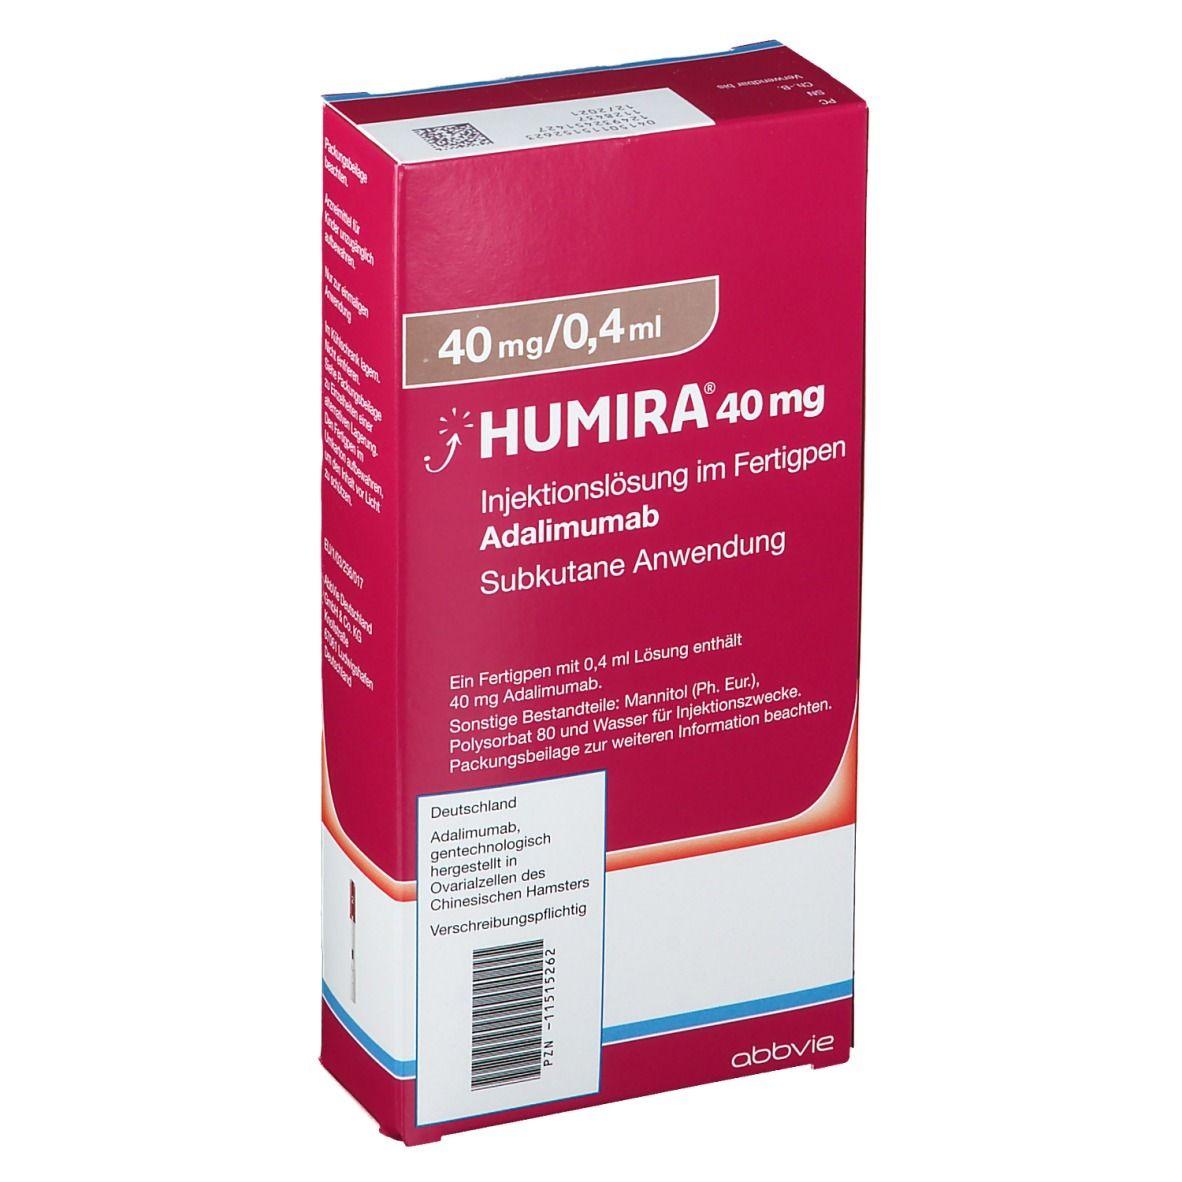 HUMIRA 40 mg/0,4 ml Injektionslösung im Fertigpen